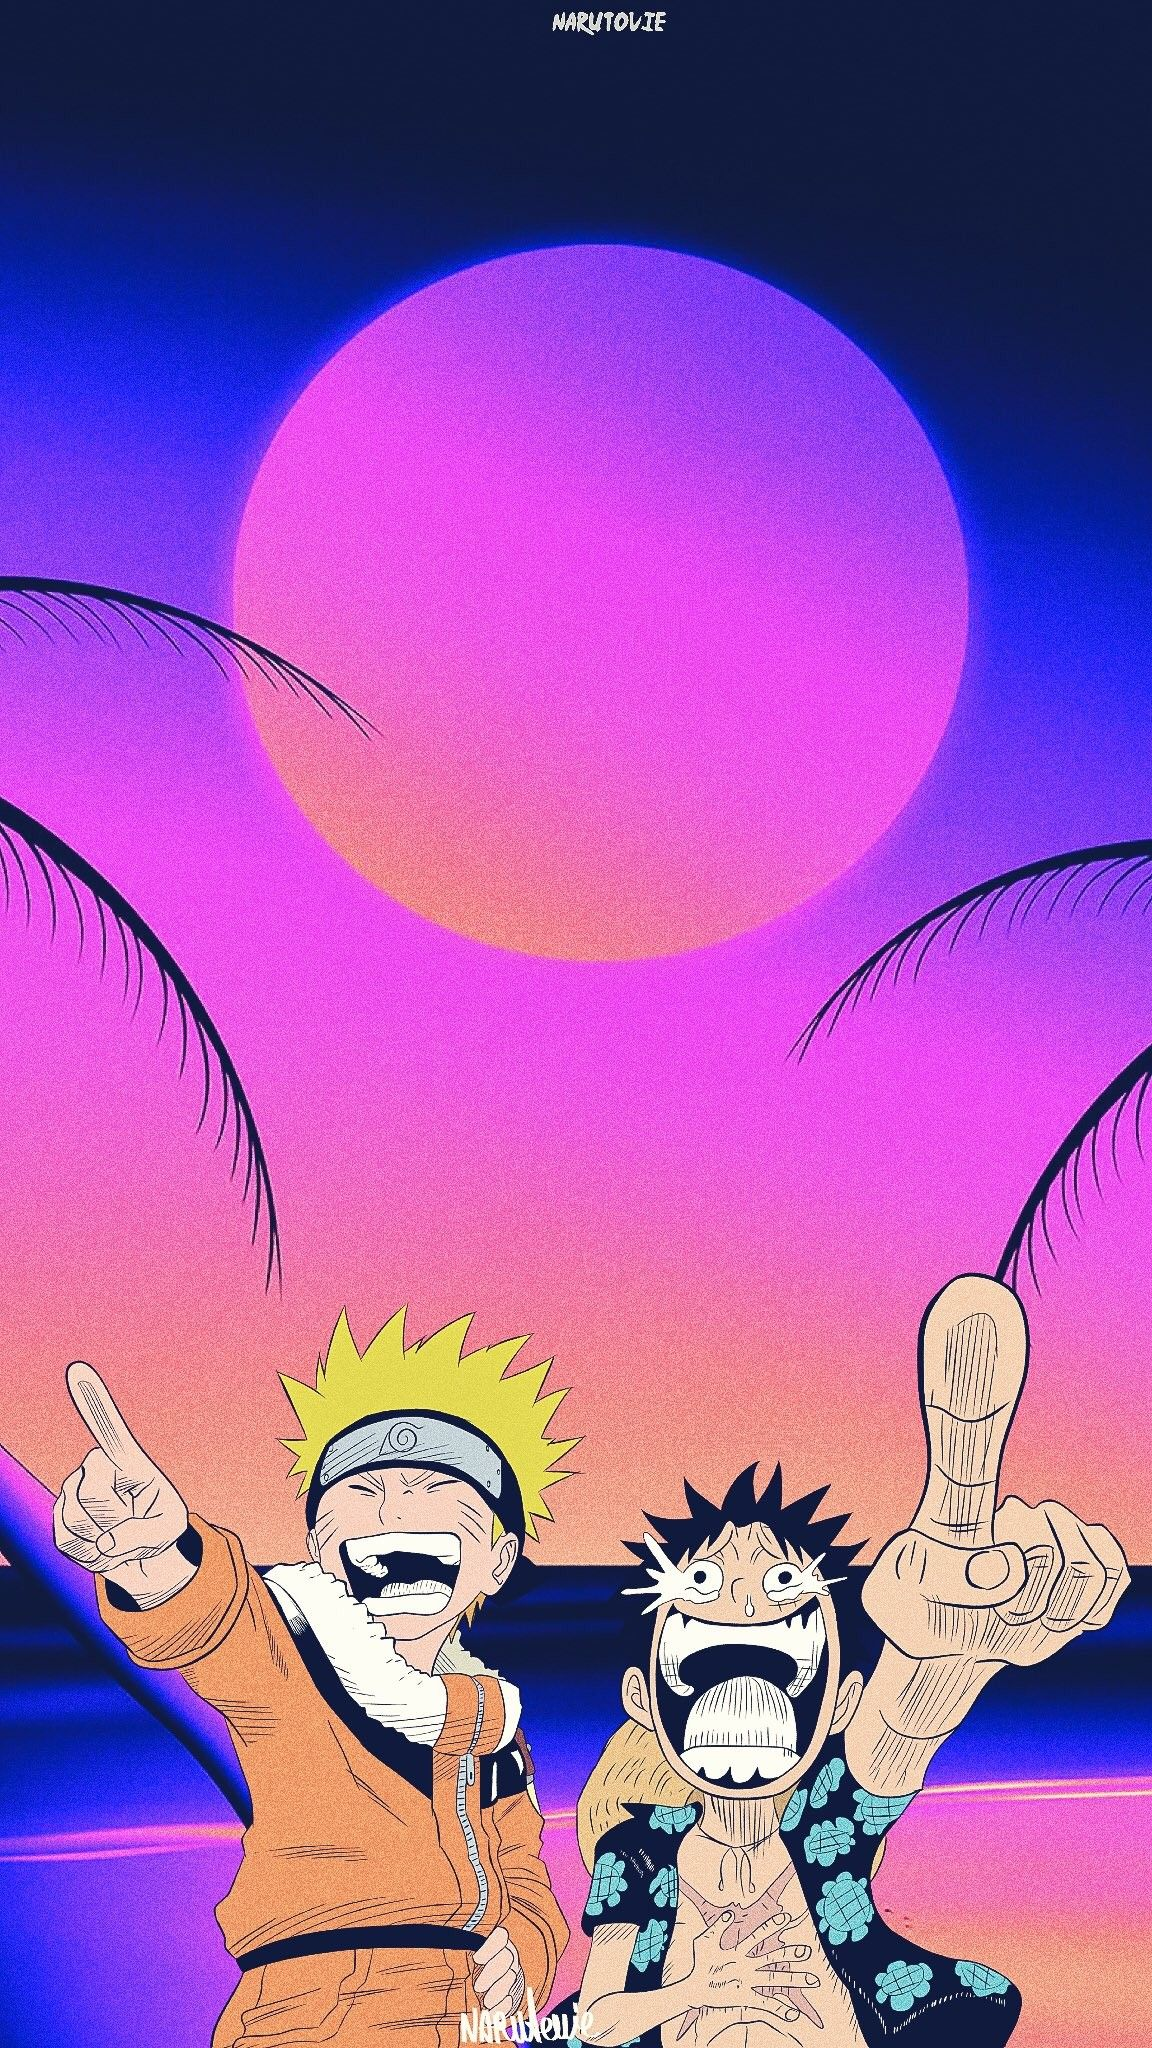 Naruto X Luffy Fond D Ecran Dessin Fond D Ecran Telephone Dessin One Piece